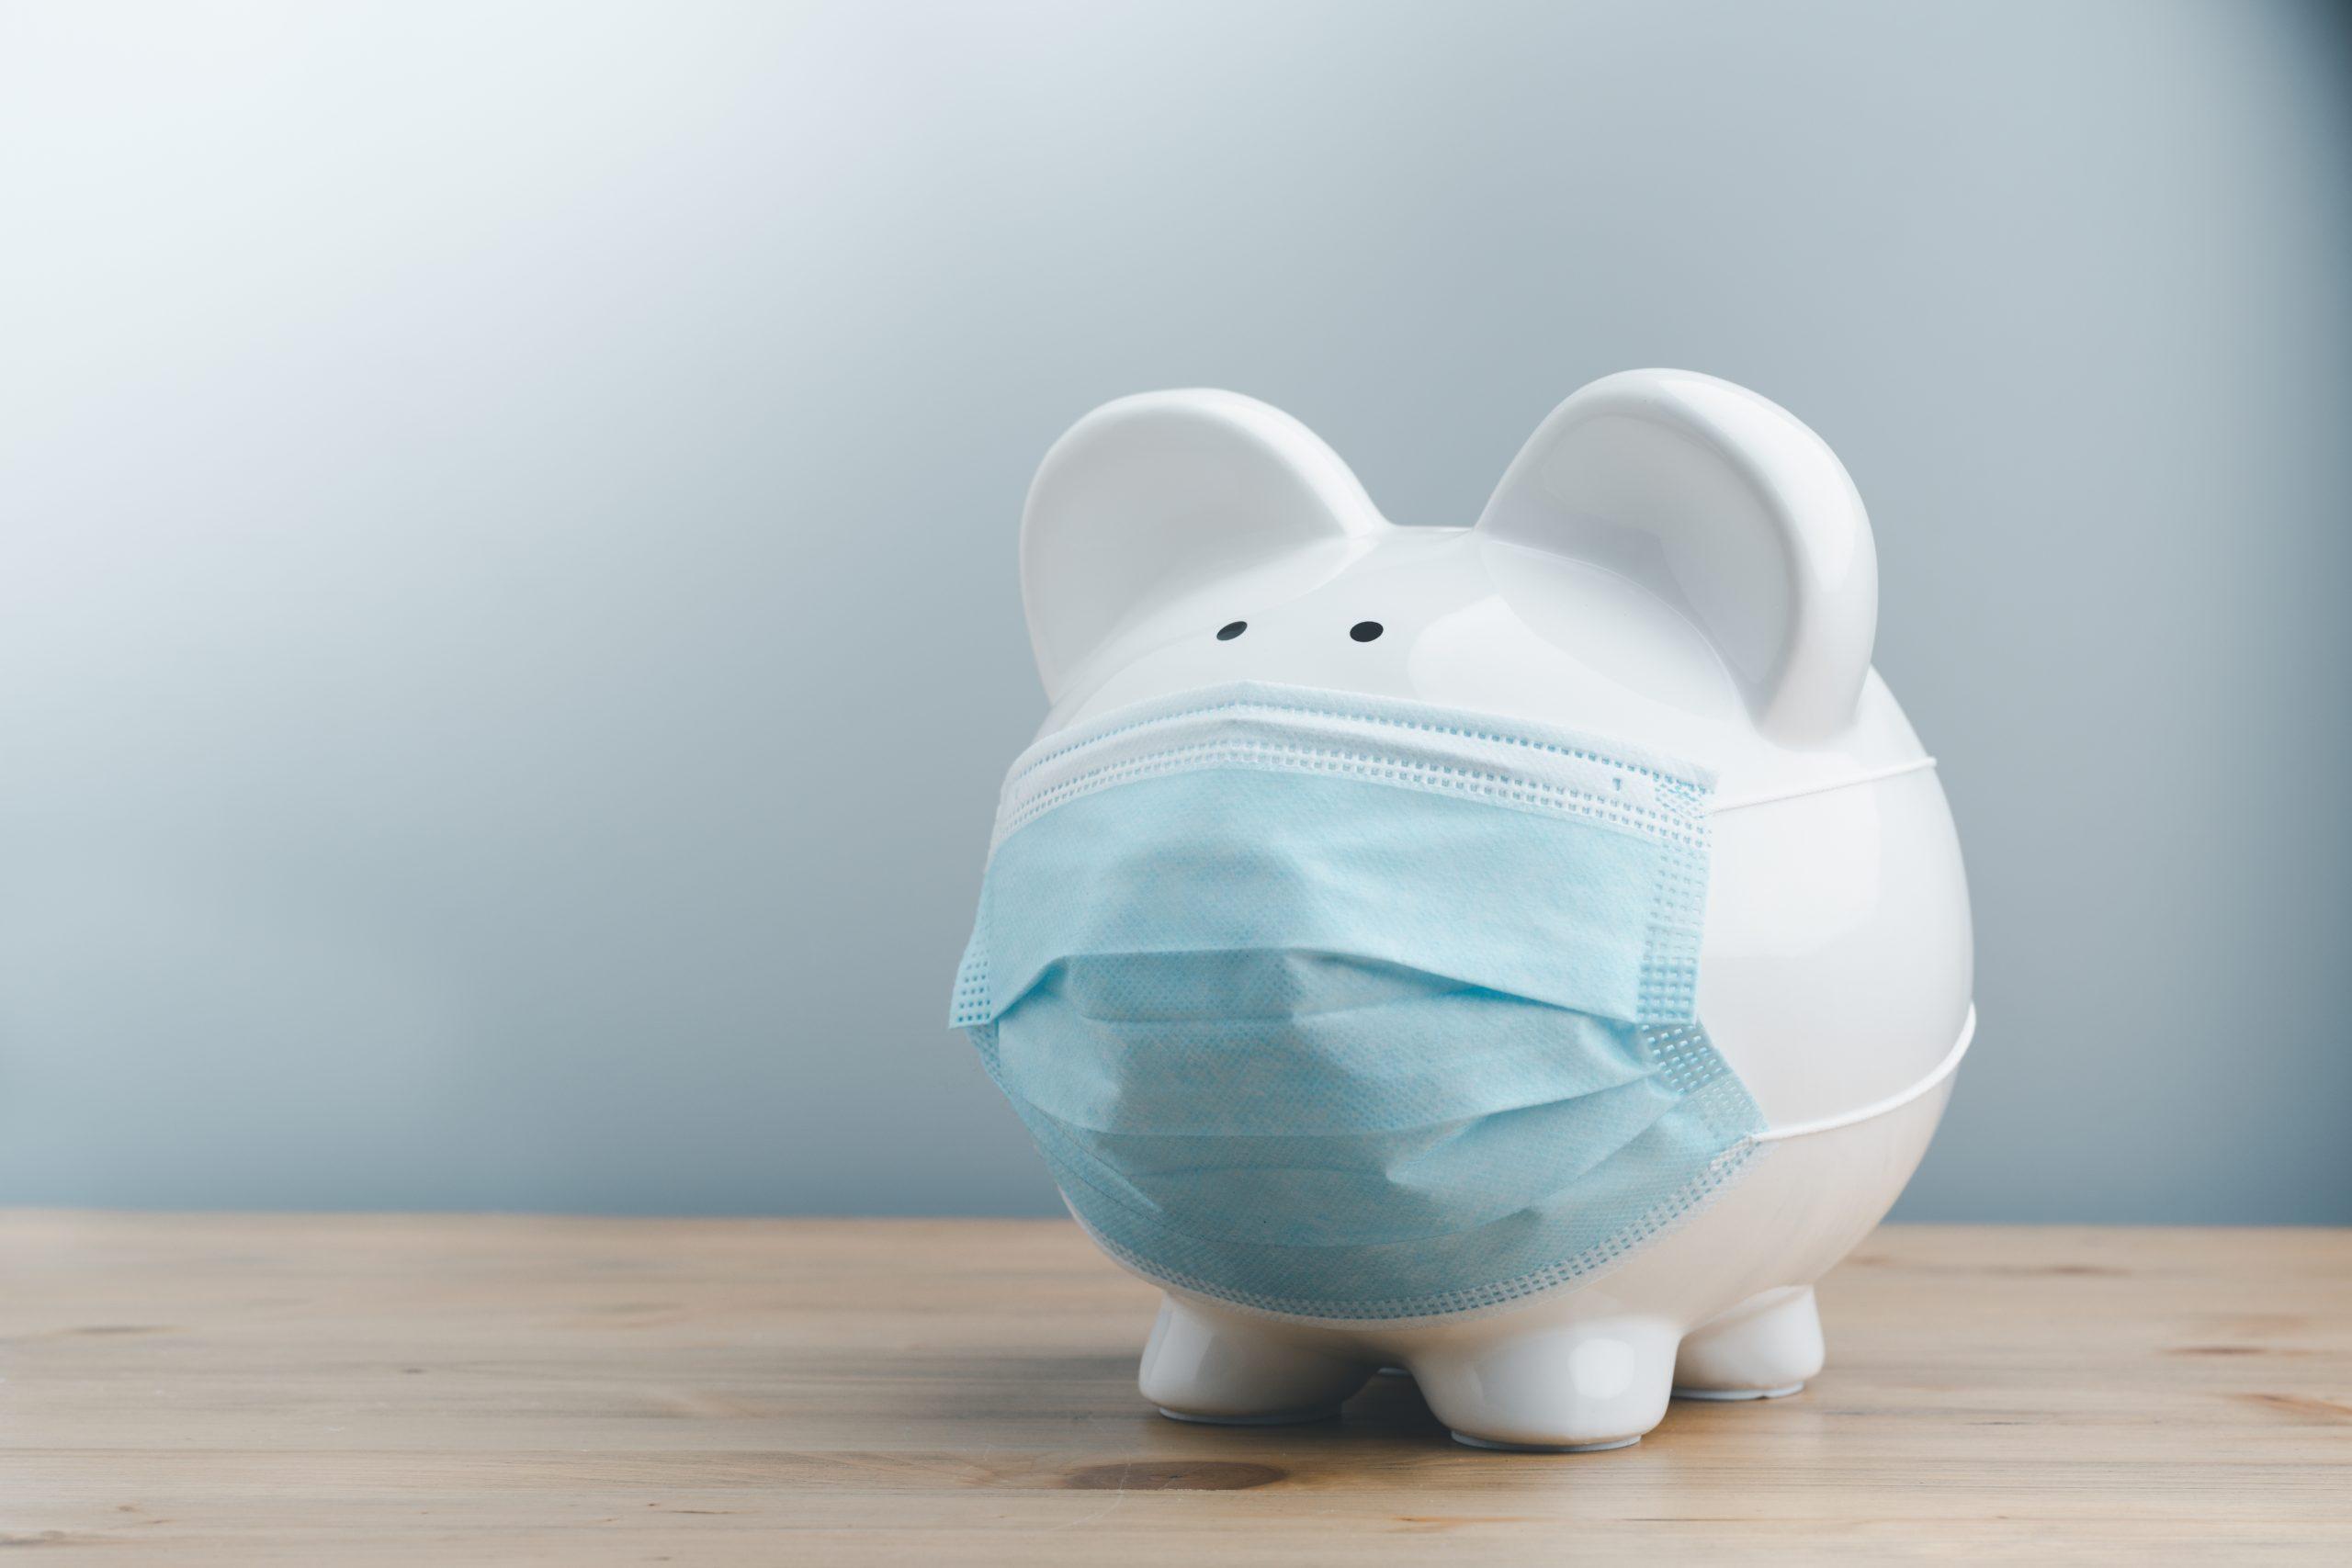 Did U.S. Taxpayers Fund COVID-19? 🦠 🤷